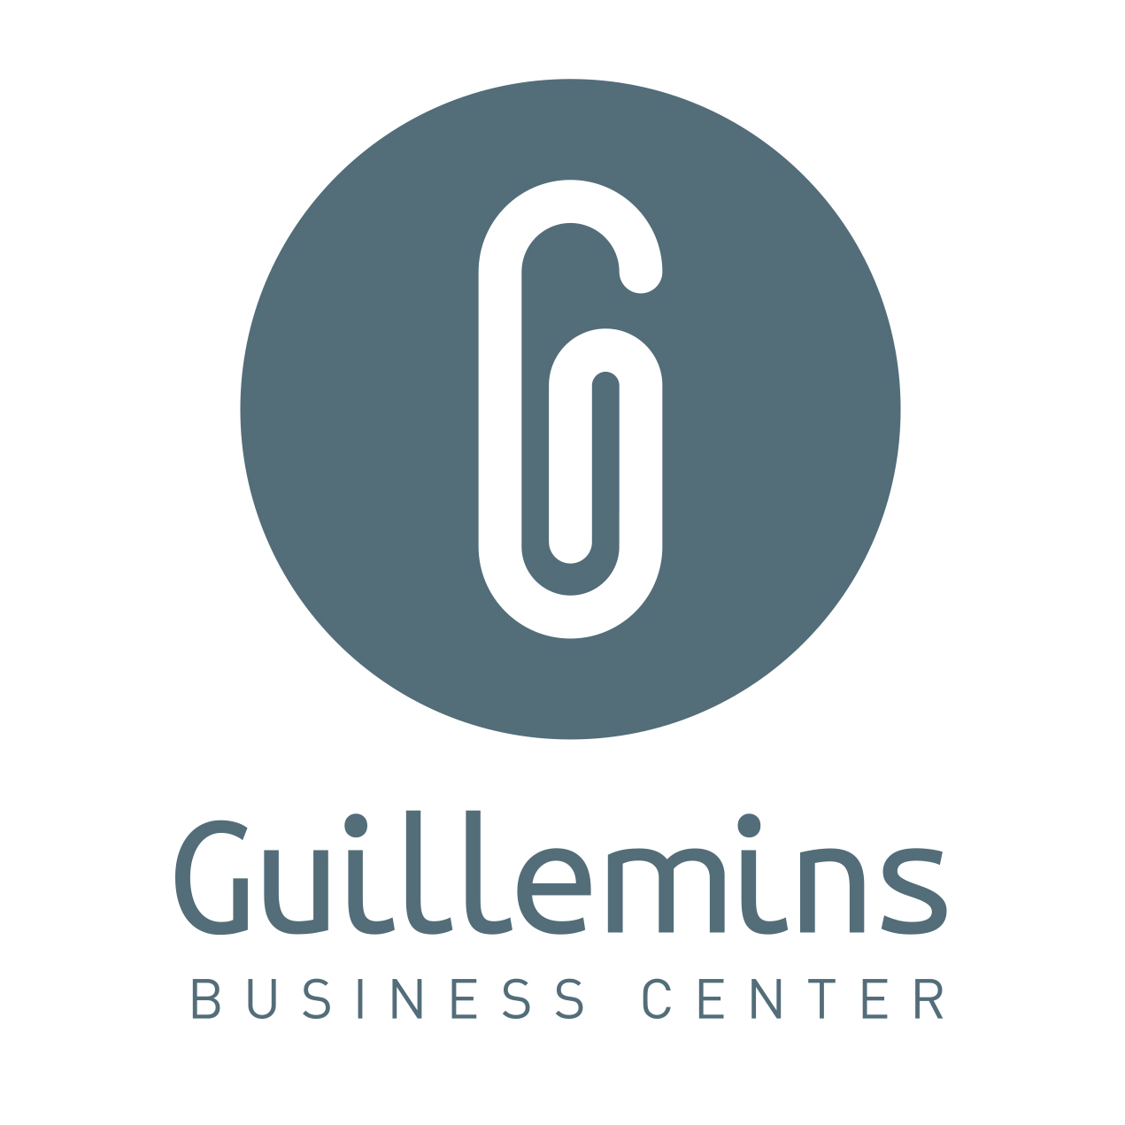 guillemins business center.png